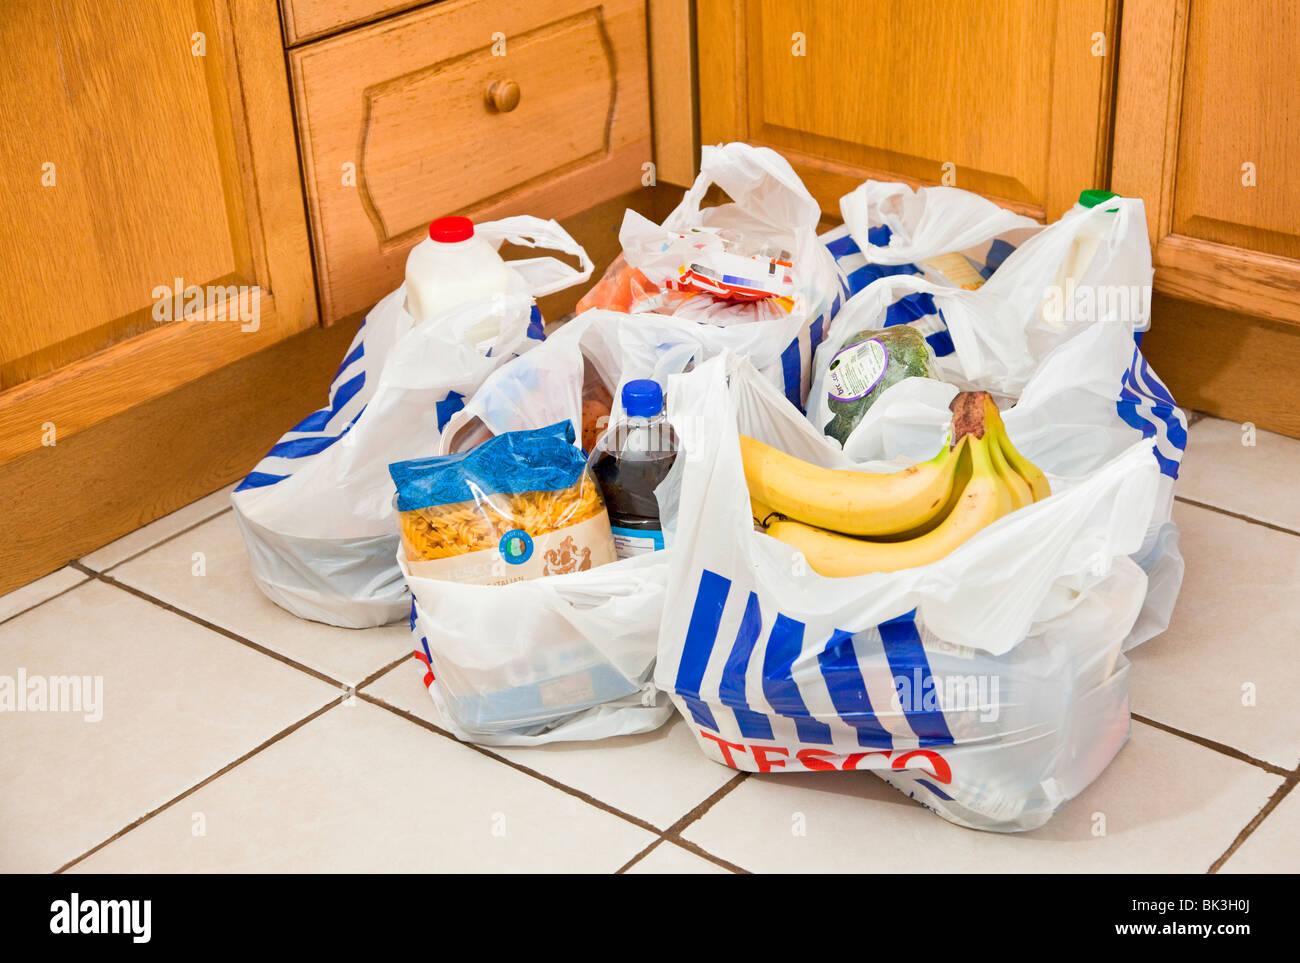 Tesco carrier bags full of shopping on a kitchen floor UK - Stock Image